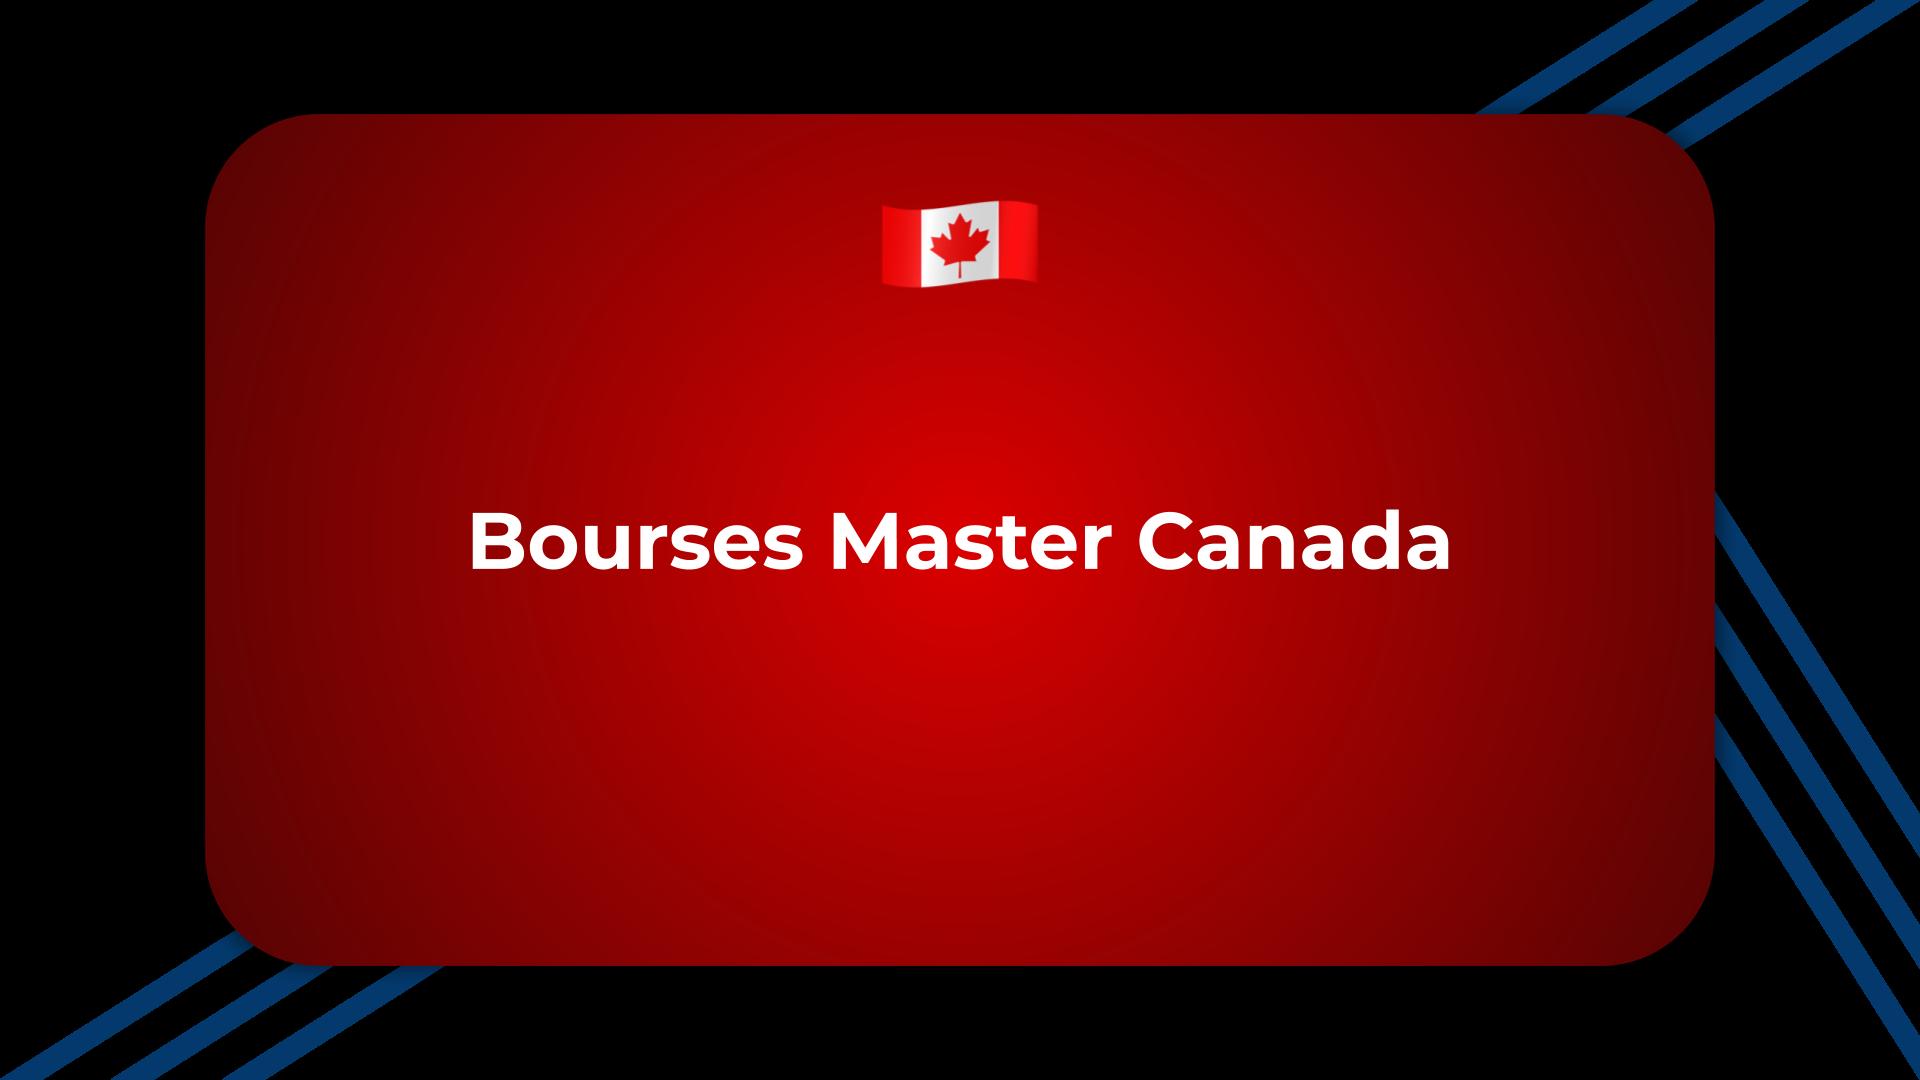 Bourses Master Canada